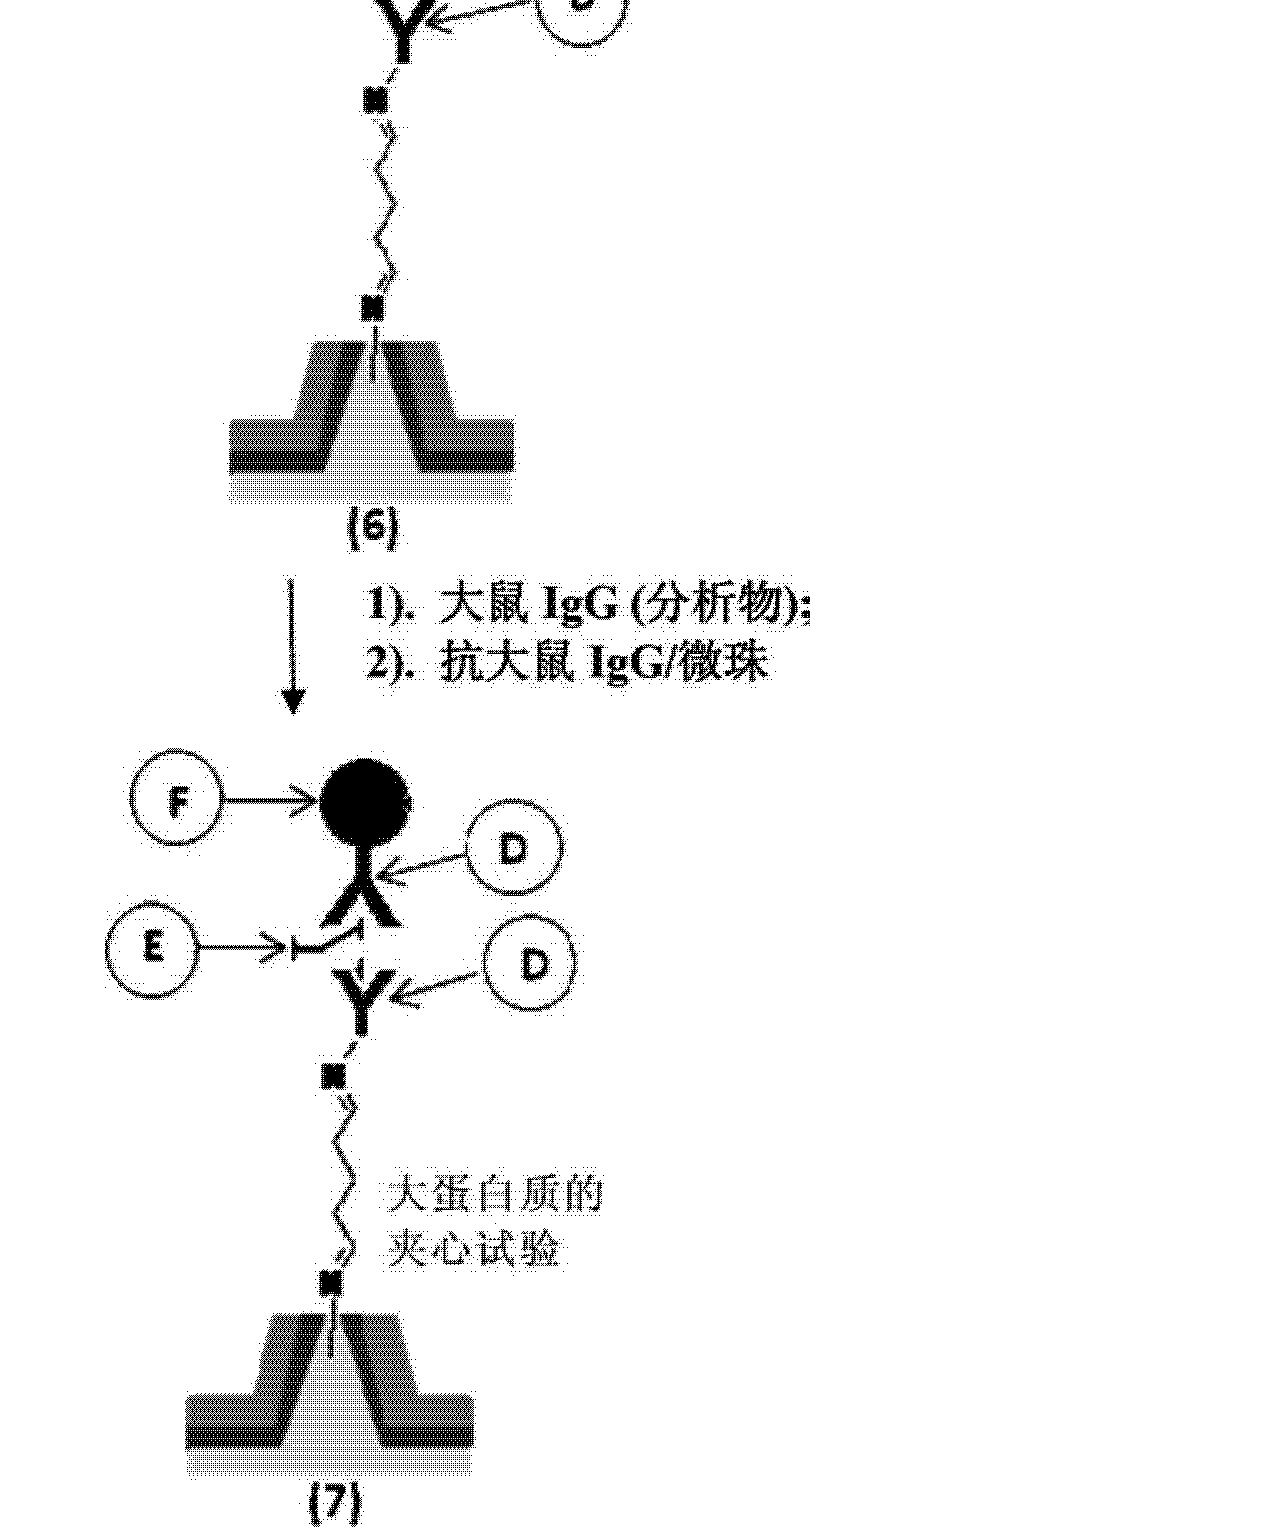 CN102971629A - Microarrays - Google Patents